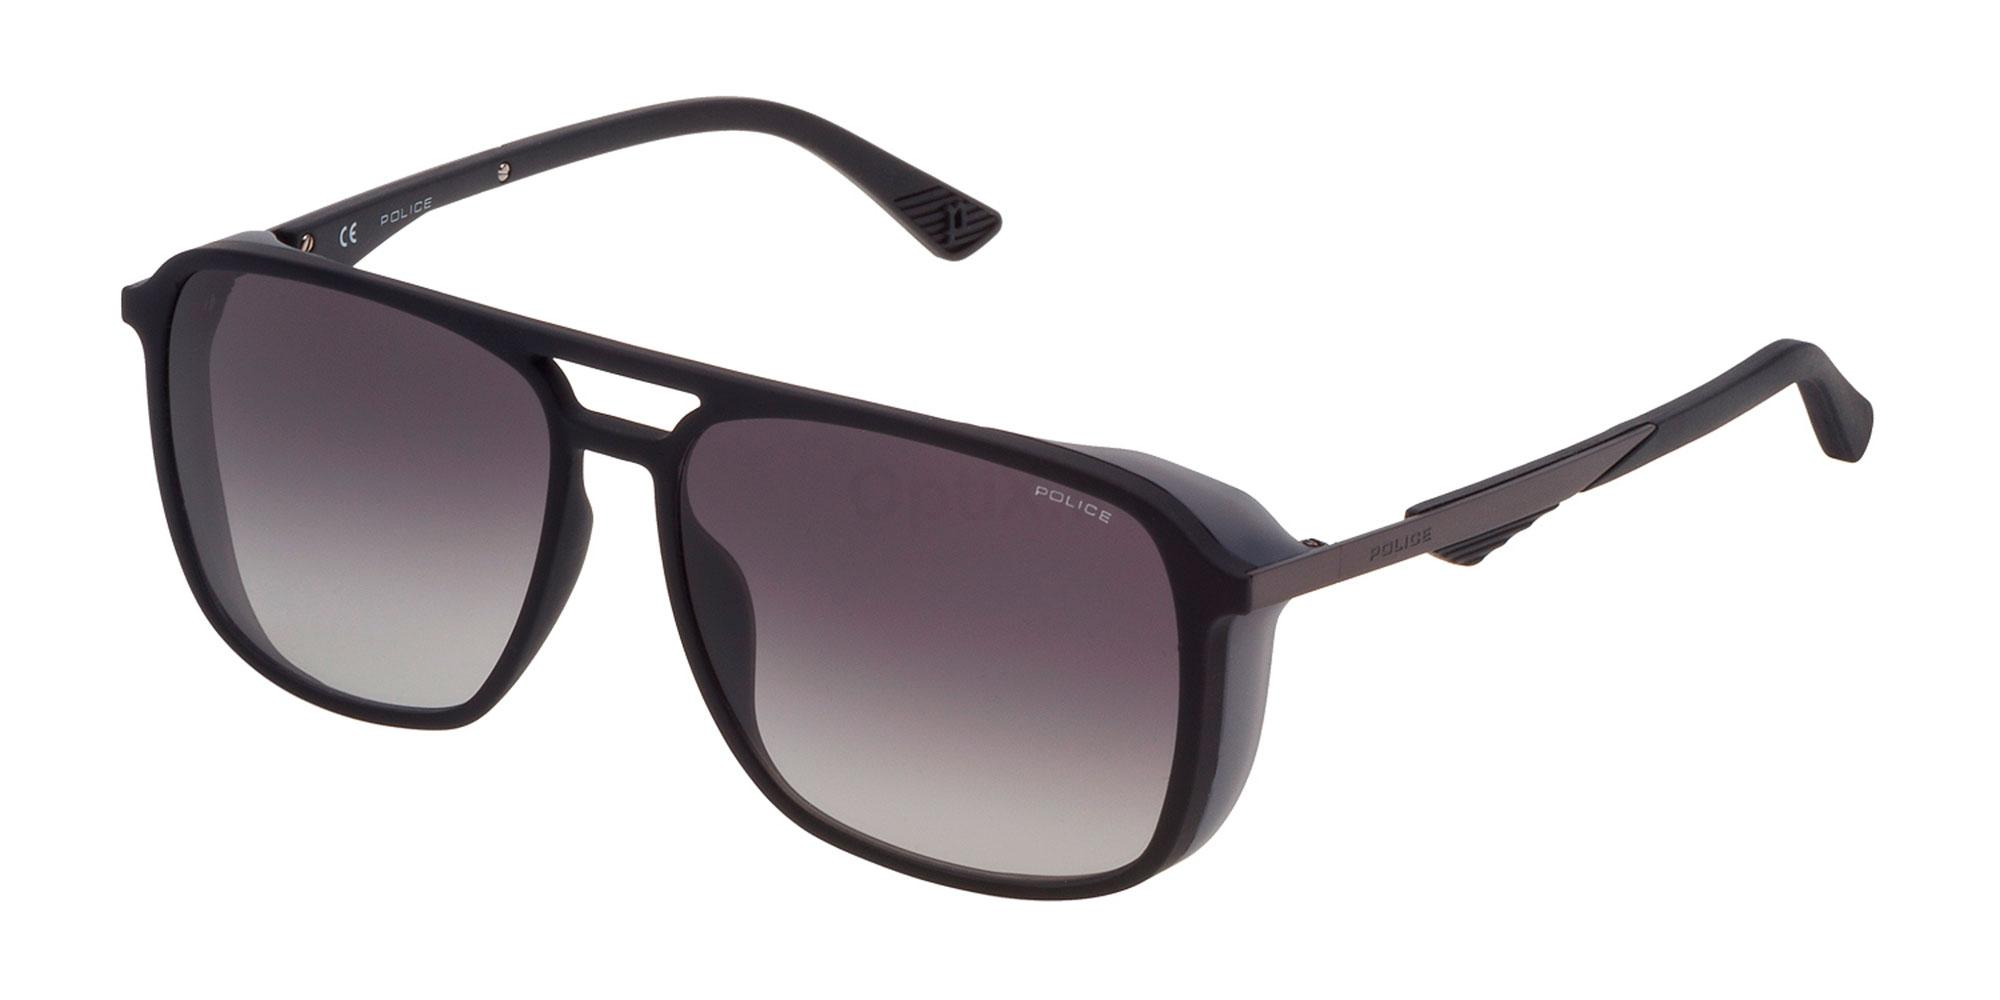 06AA SPL720 Sunglasses, Police